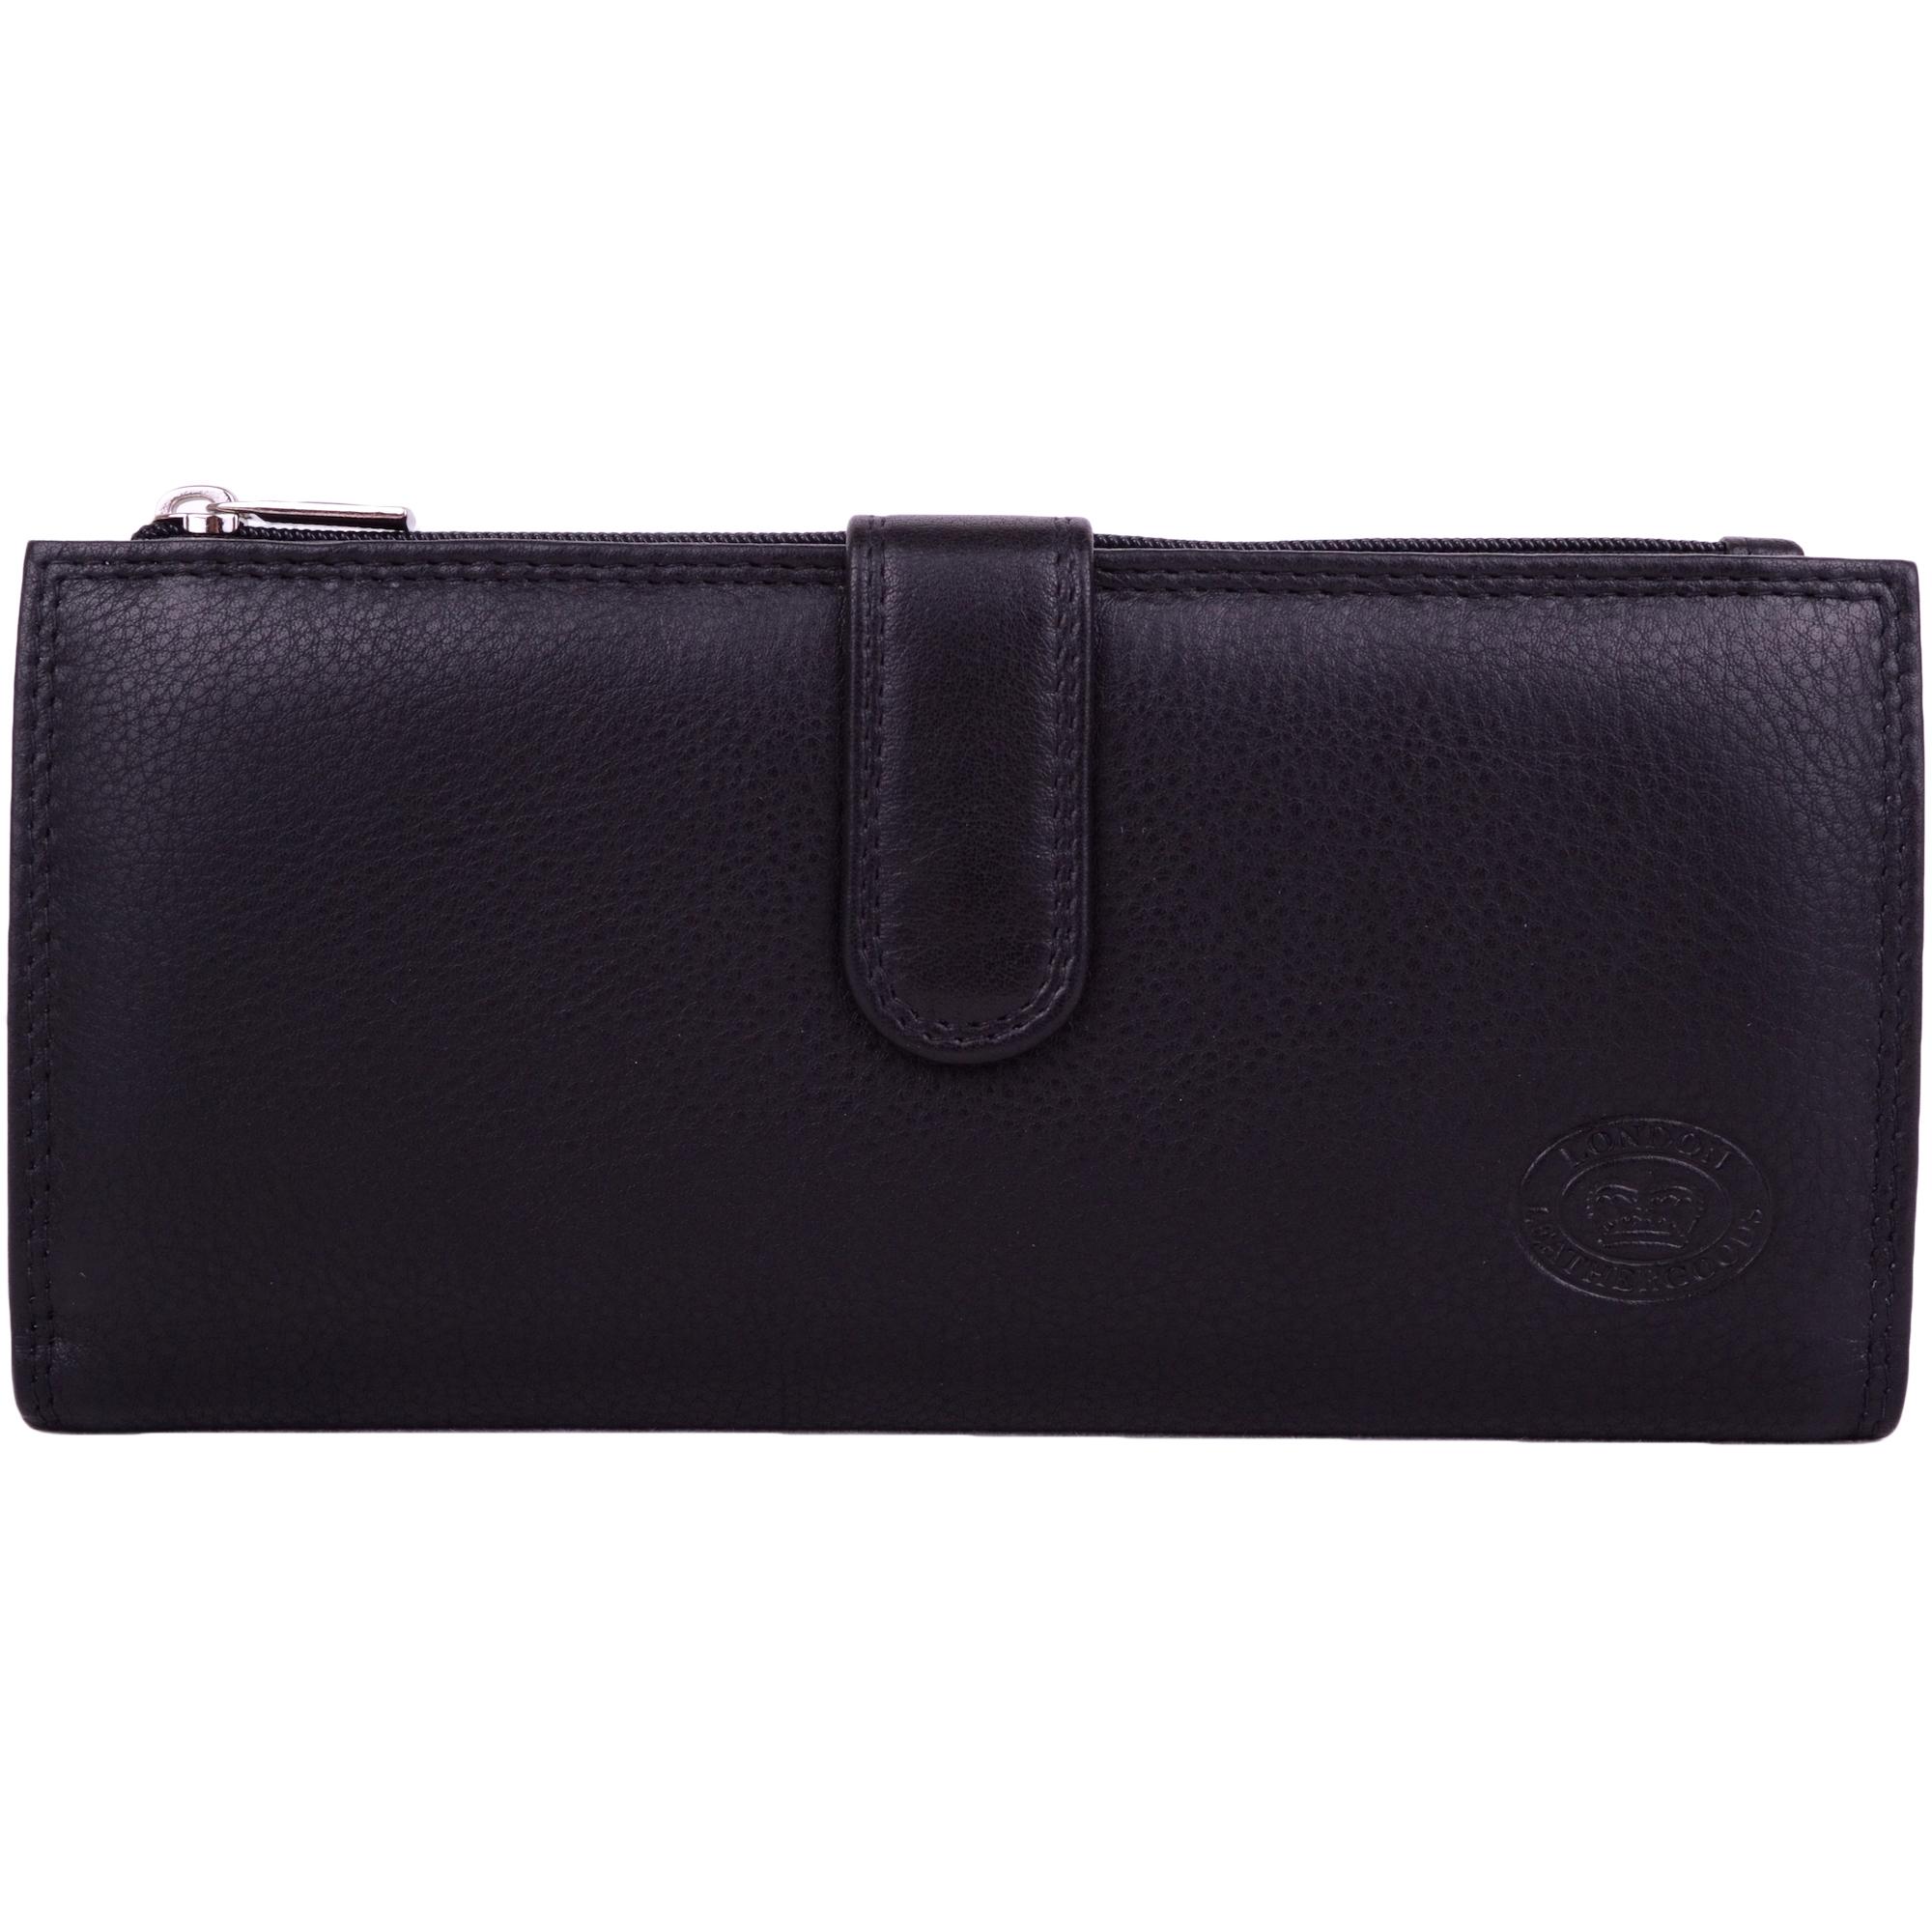 Soft Leather Slim Purse RFID Protected